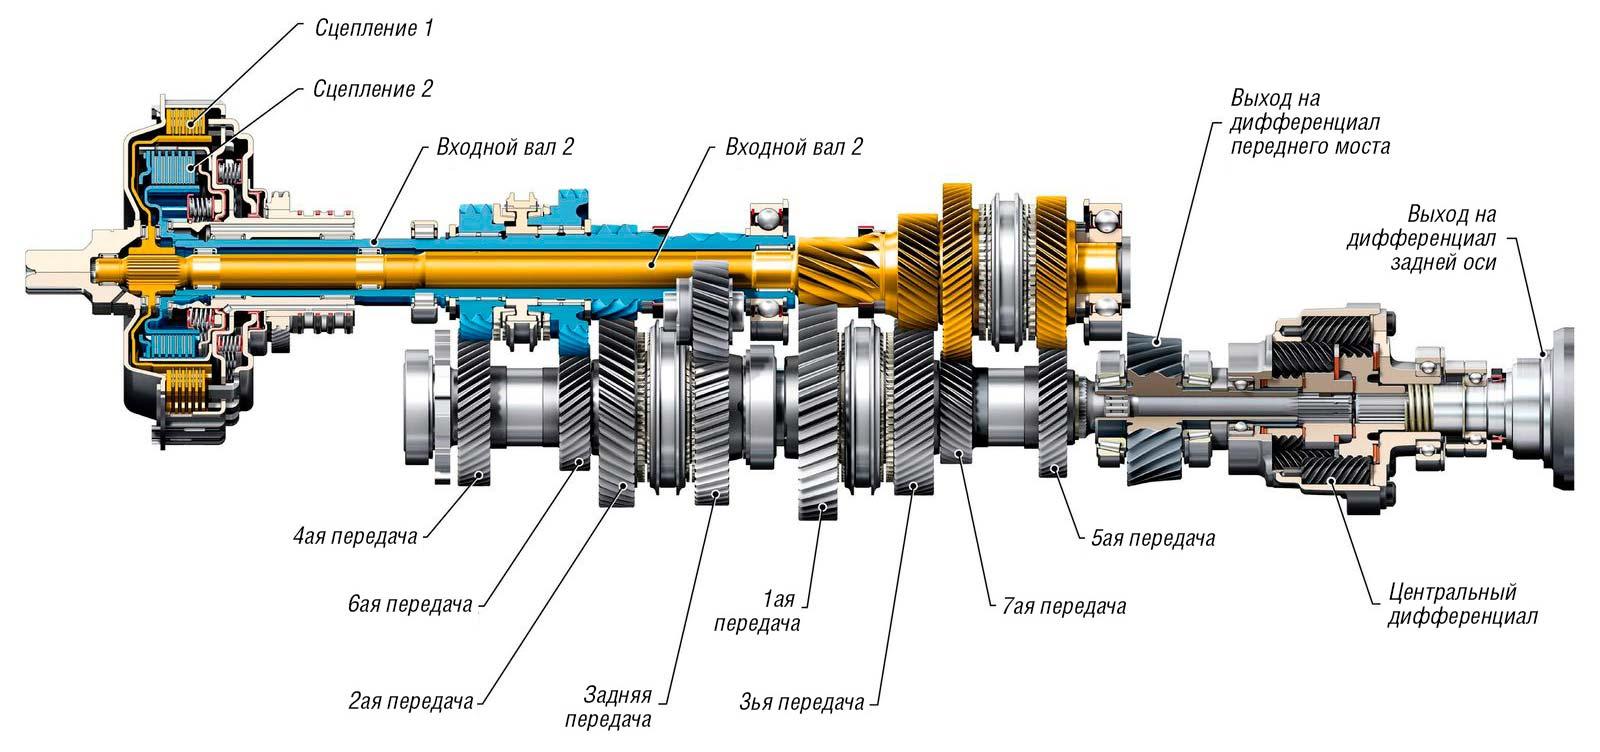 Схема ремонта и диагностики dsg